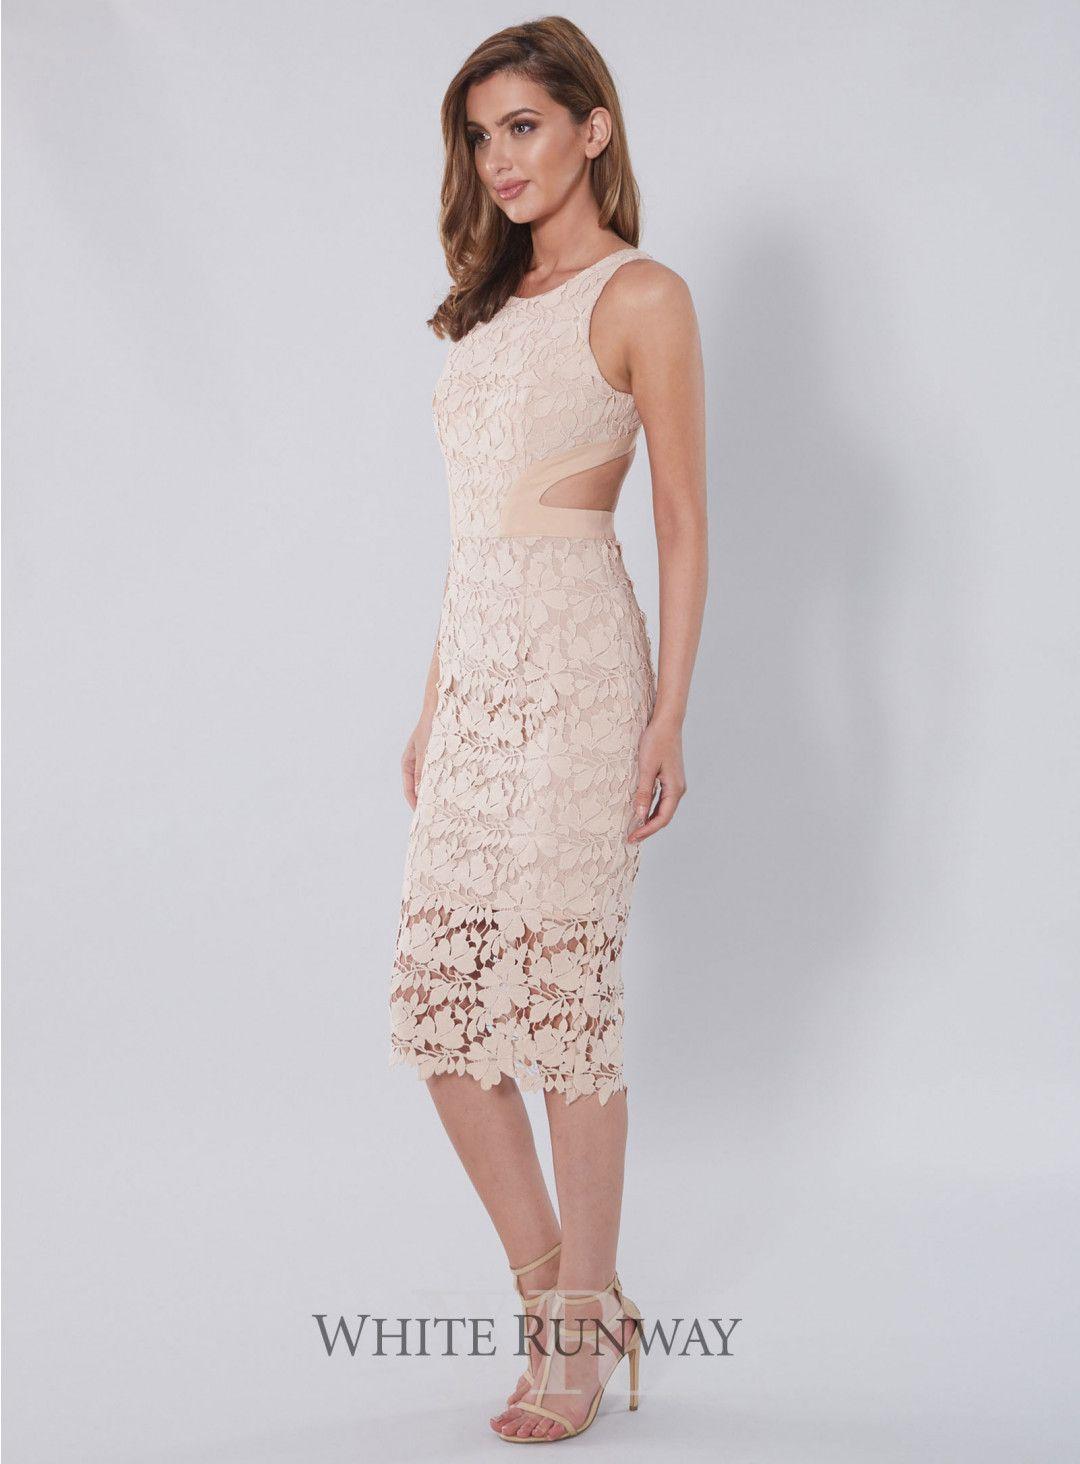 20% off! amalia lace cutout dress. a gorgeous full length dress